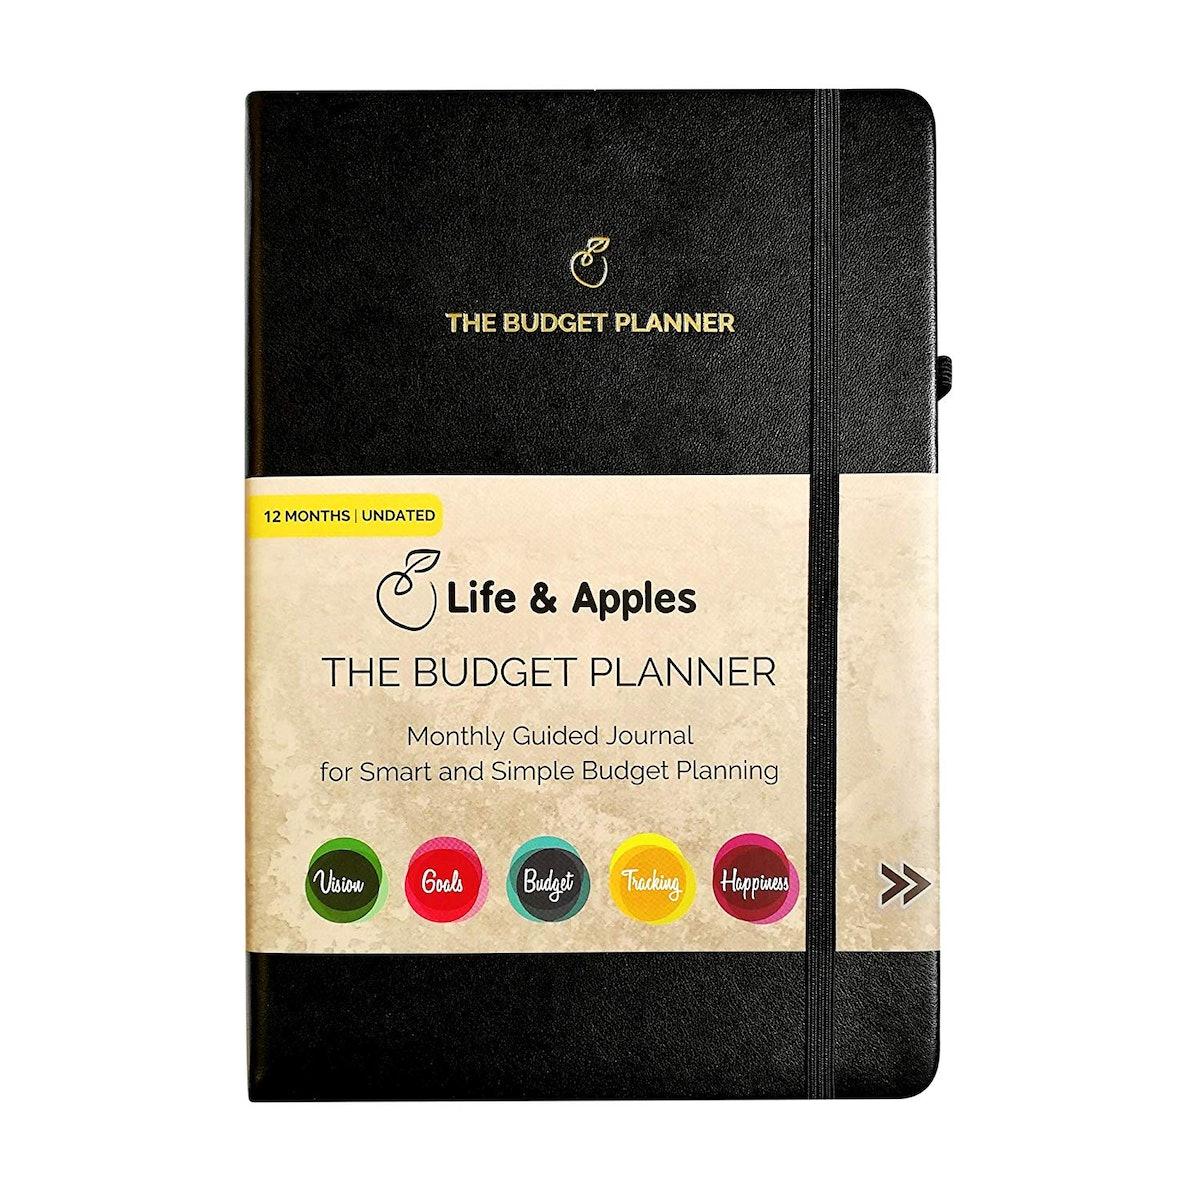 Life & Apples Budget Planner